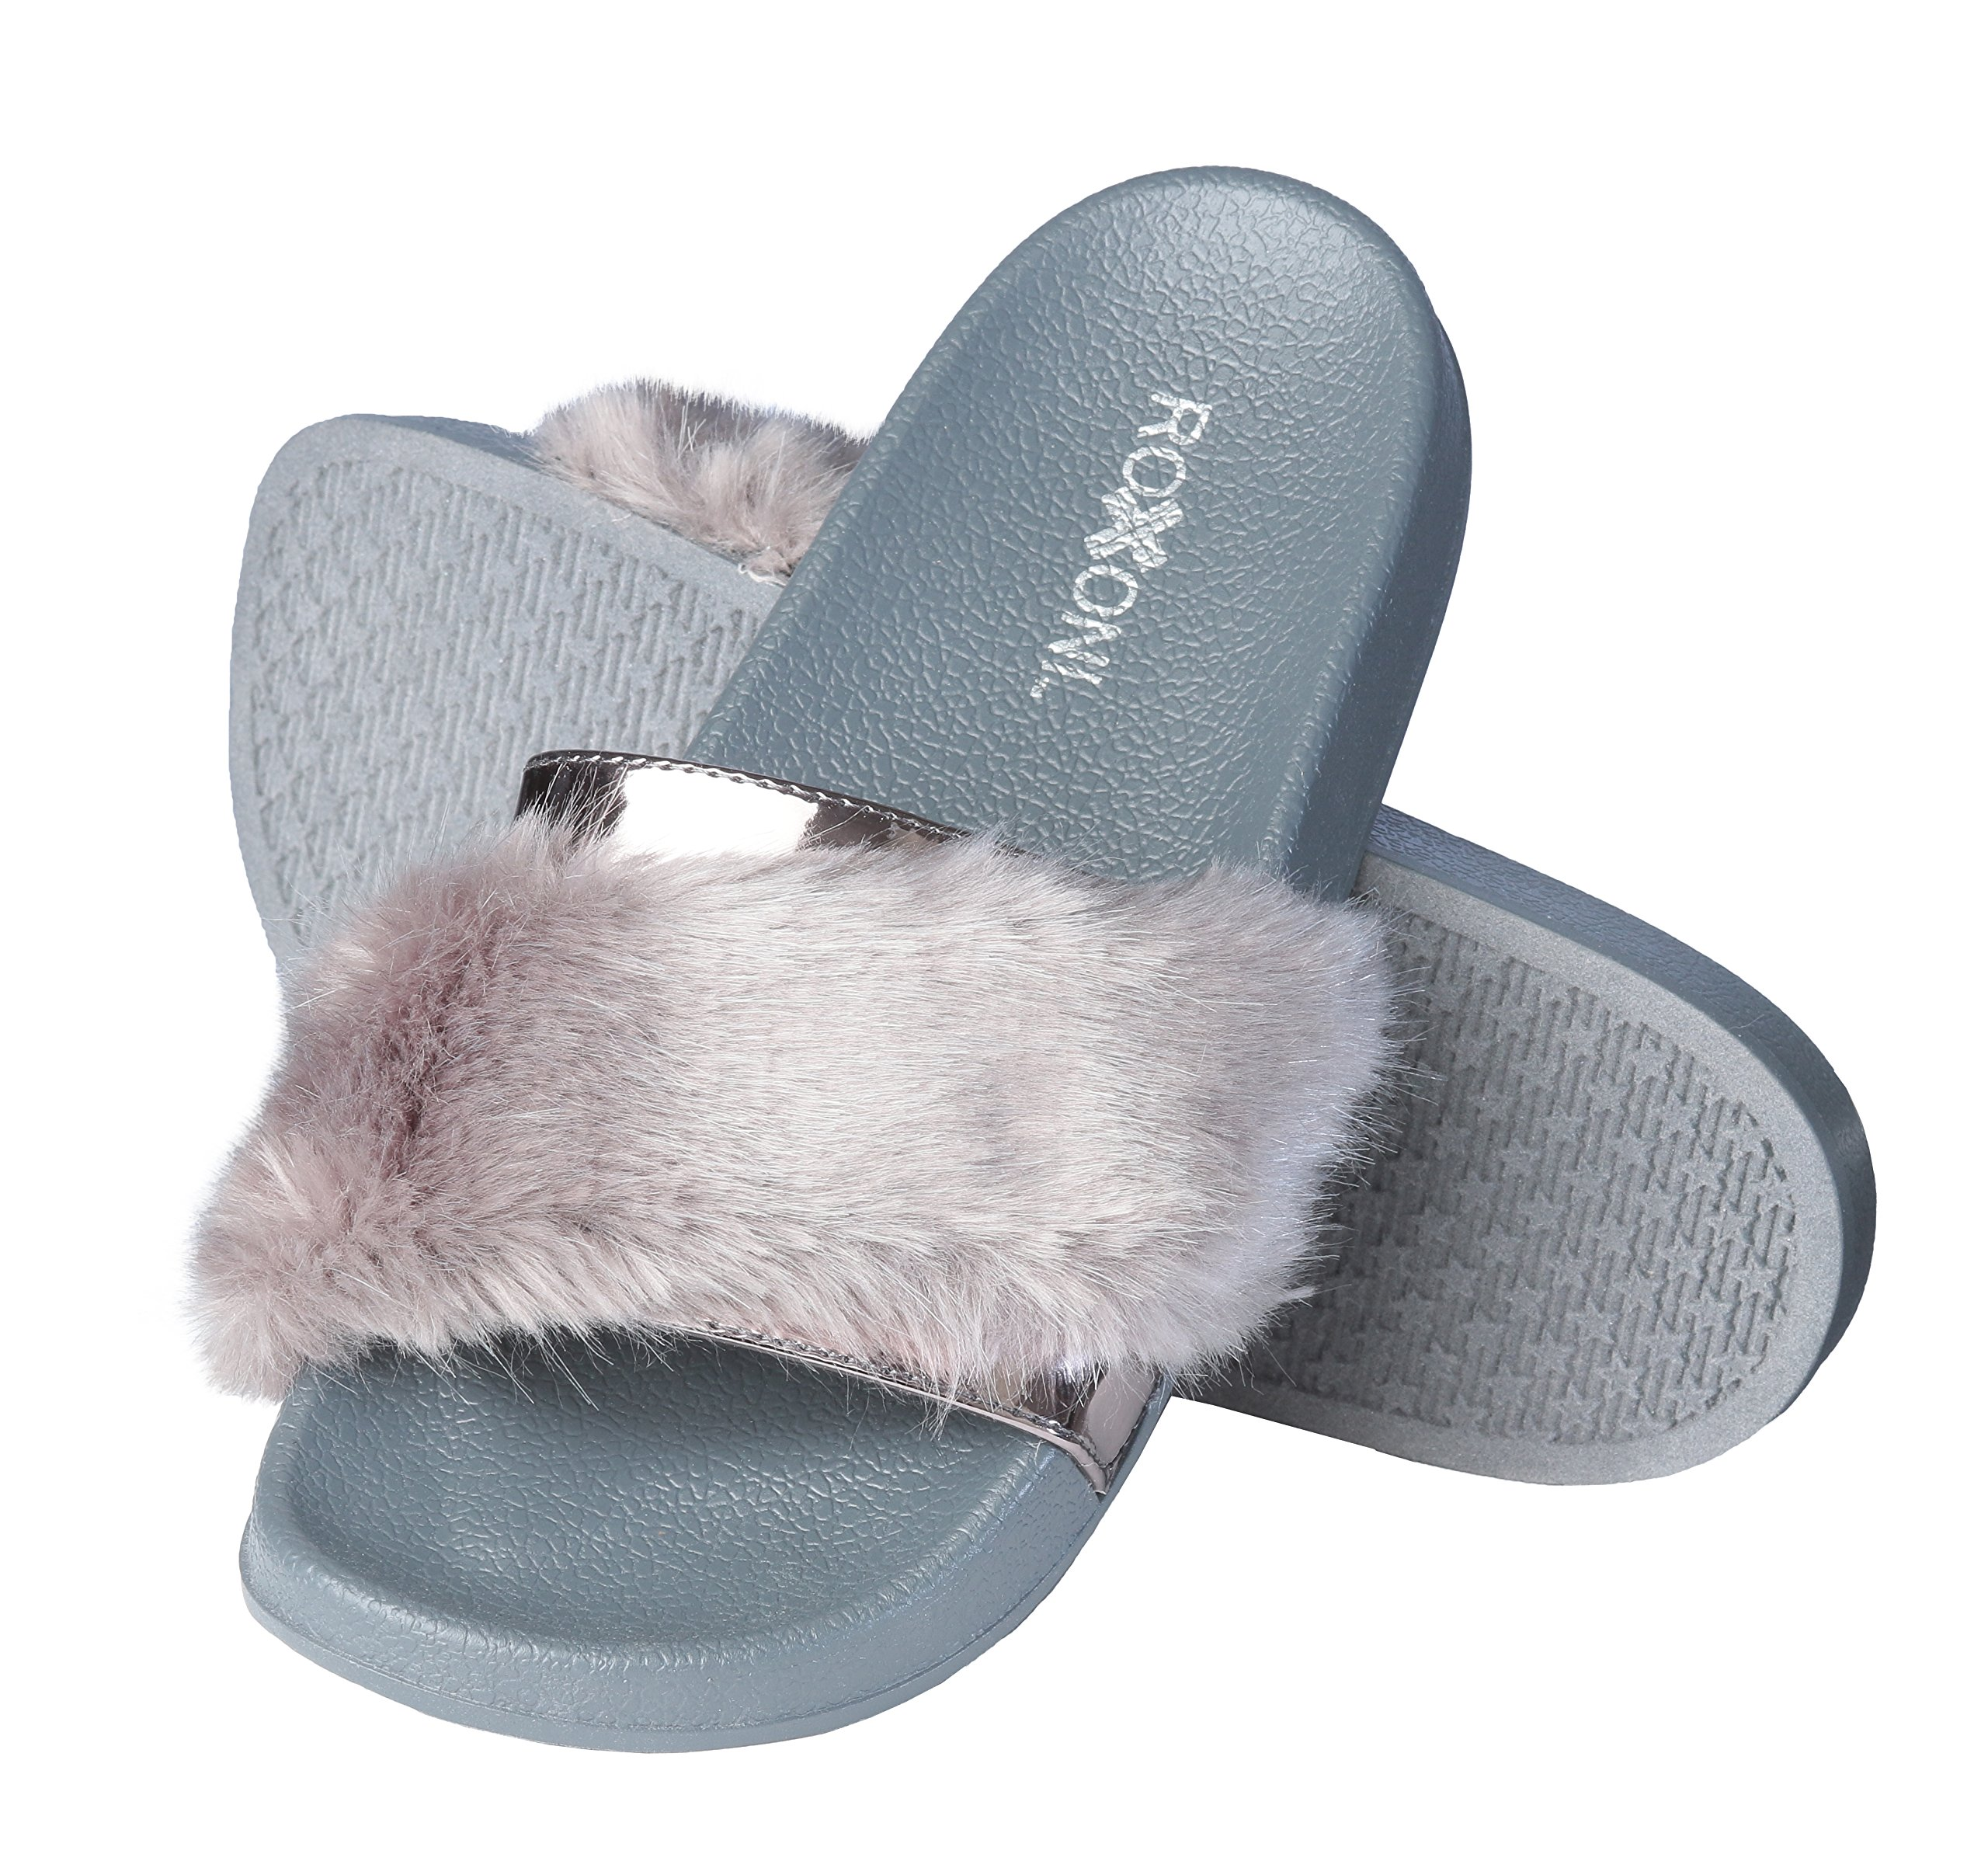 Roxoni Women's Summer Fur and Metallic Open Toe Slide Sandal Slippers